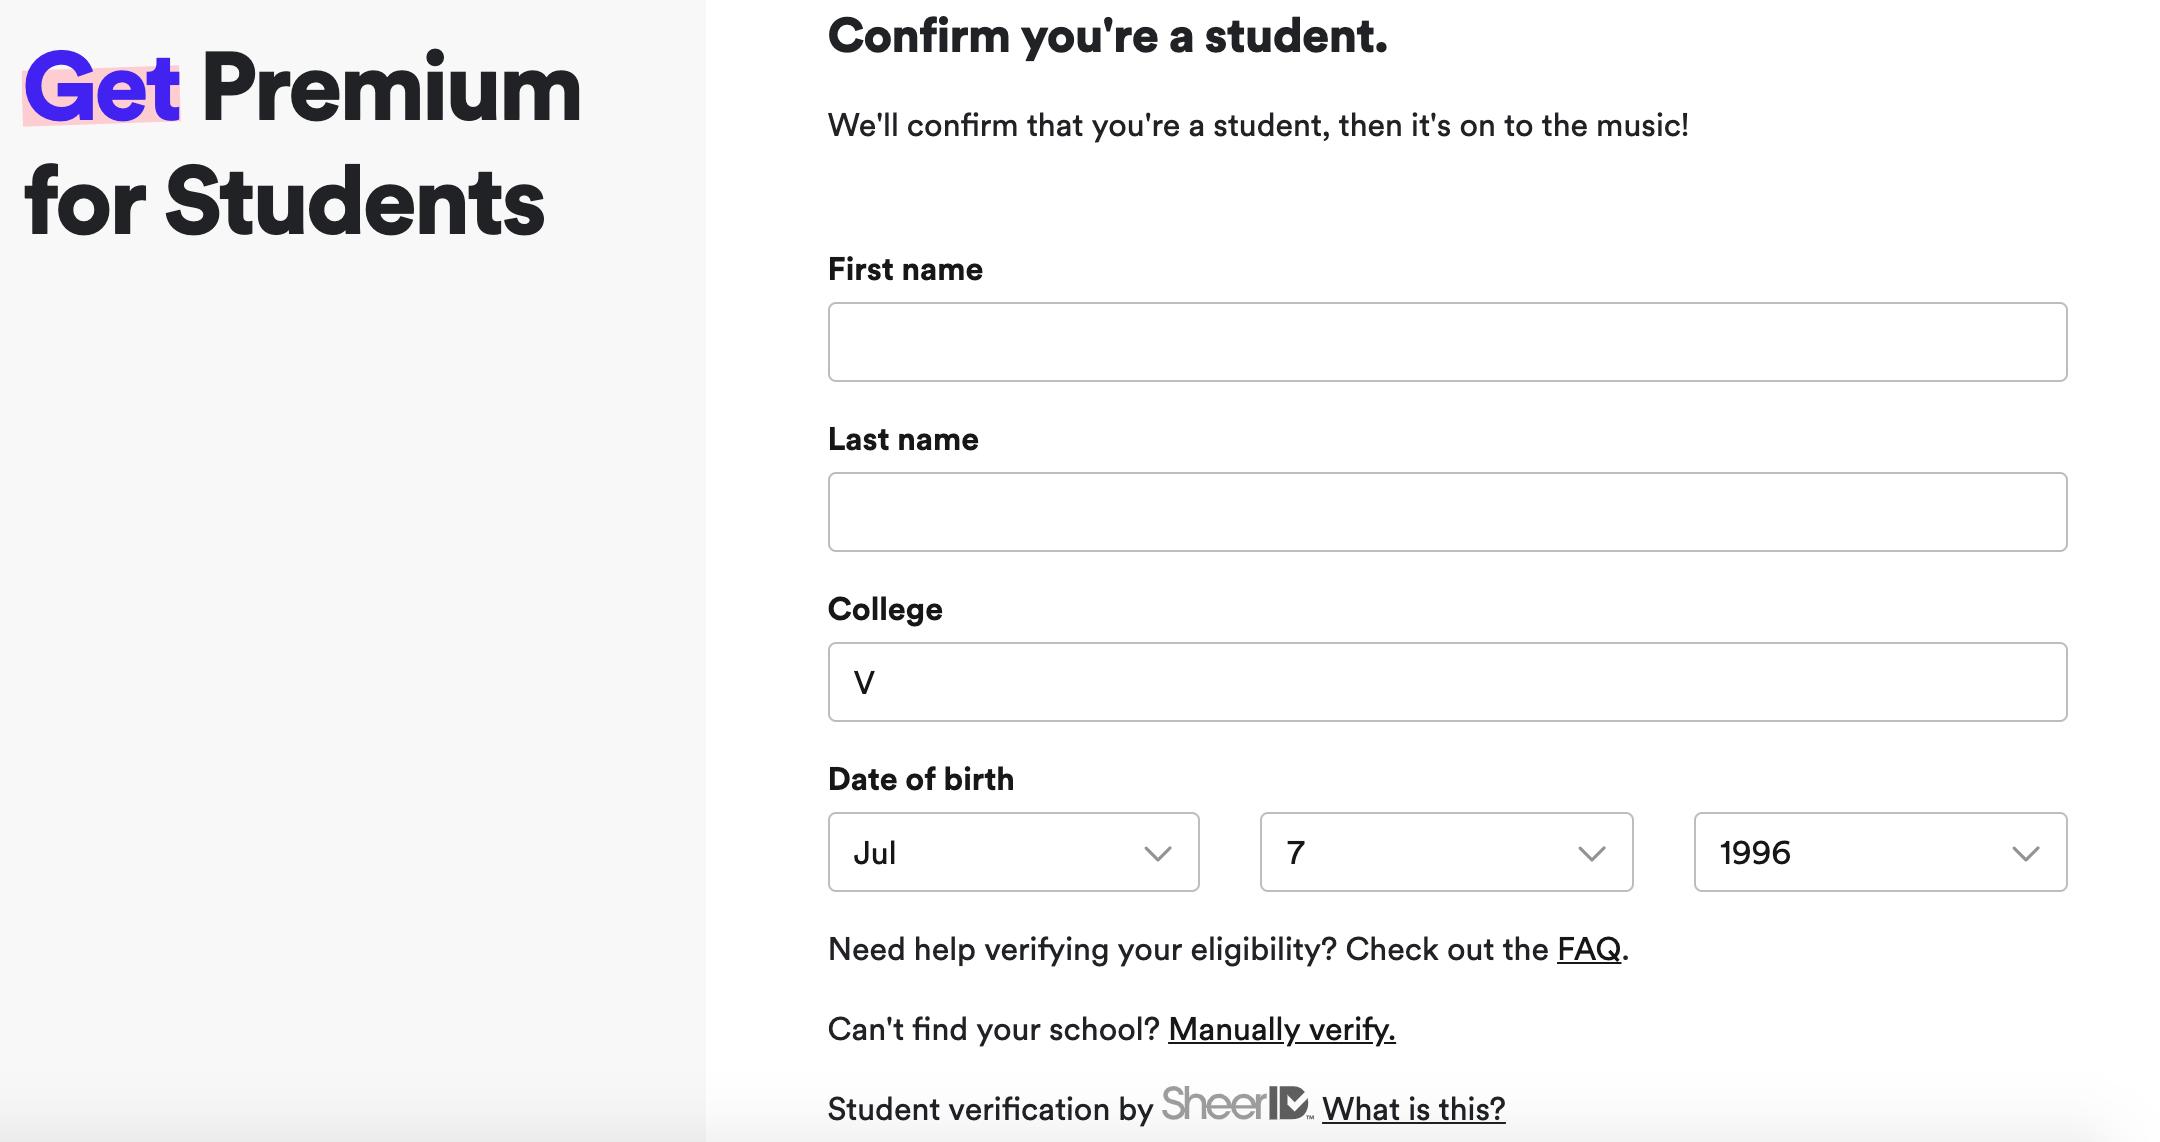 e2a85a61b Drop down glitch verify student account - The Spotify Community